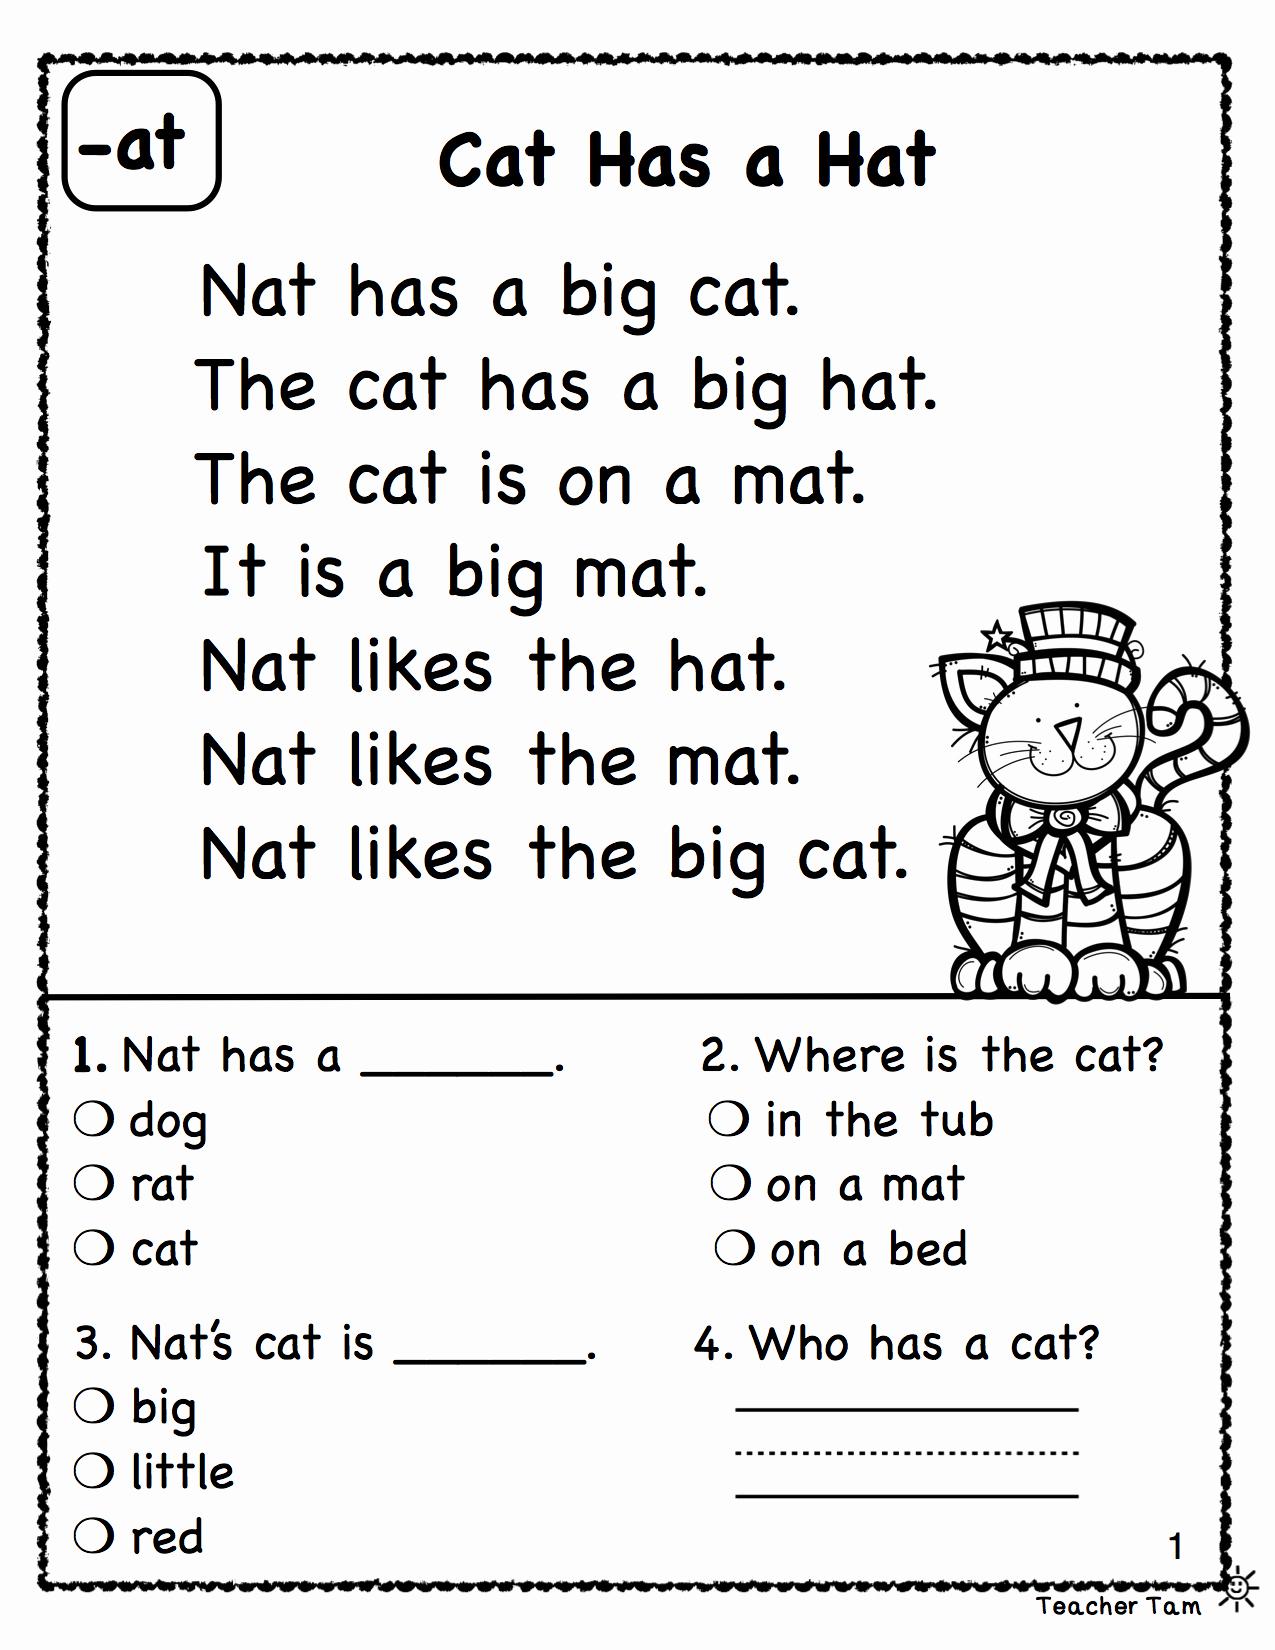 Preschool Reading Comprehension Worksheets New Reading Prehension Set 1 From Teacher Tam